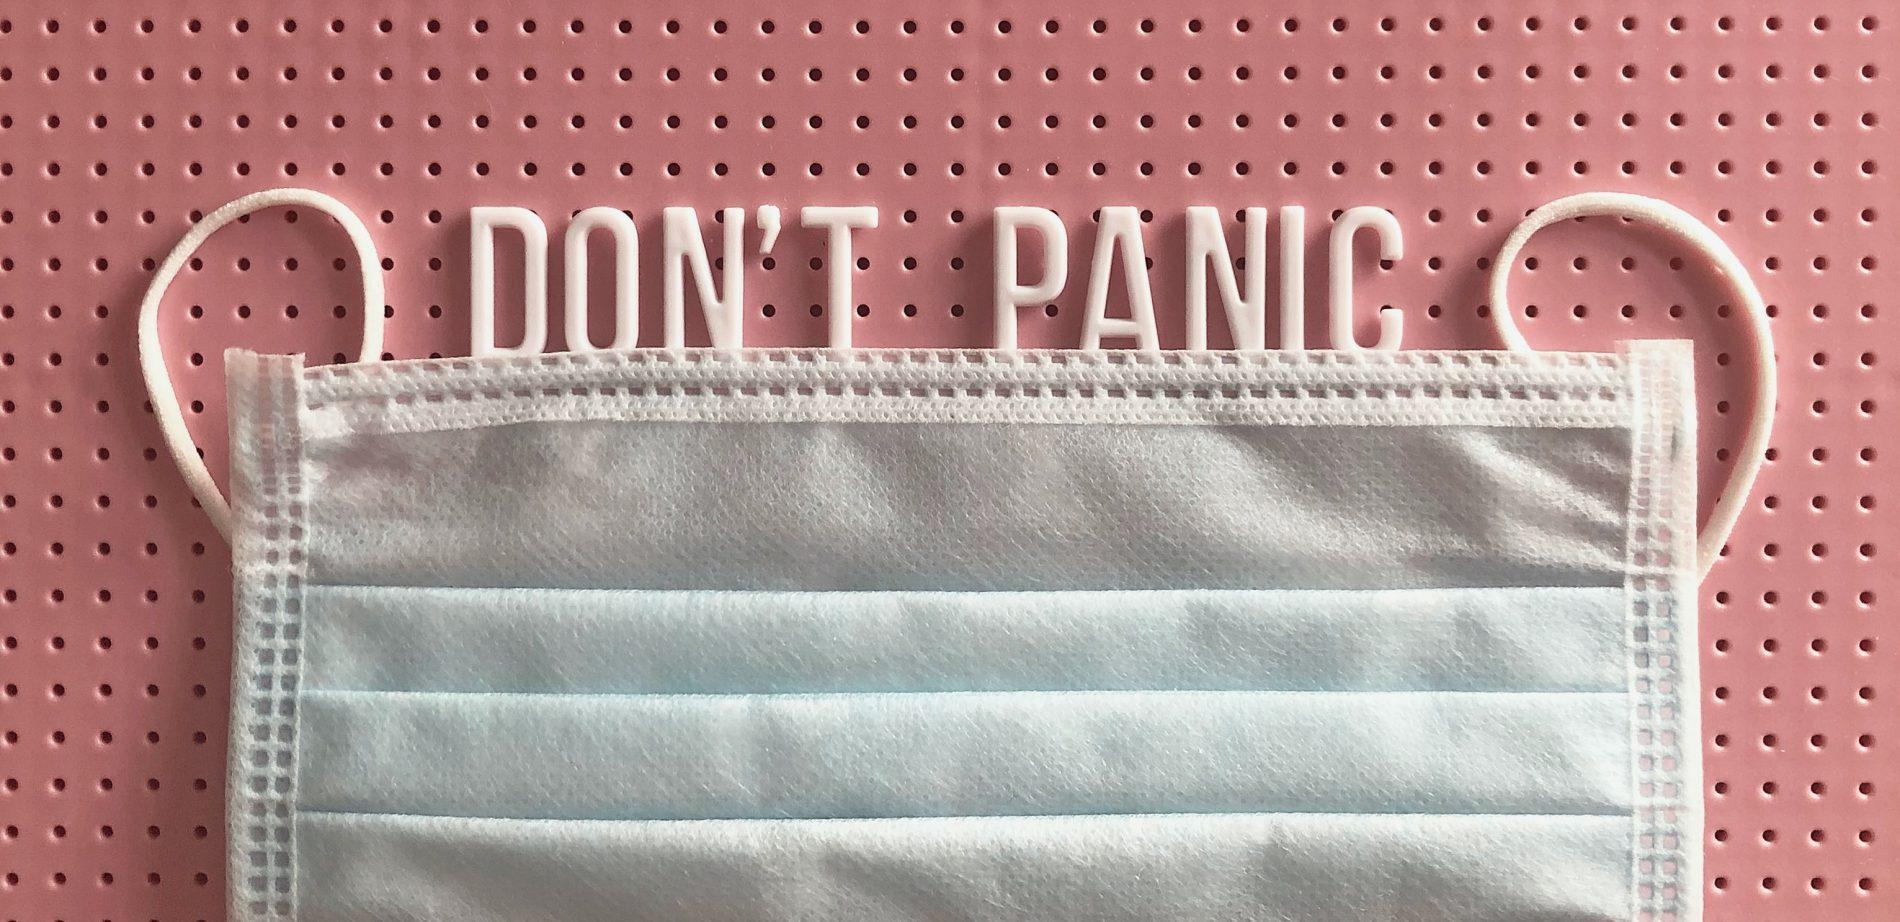 Post-Lockdown Anxiety